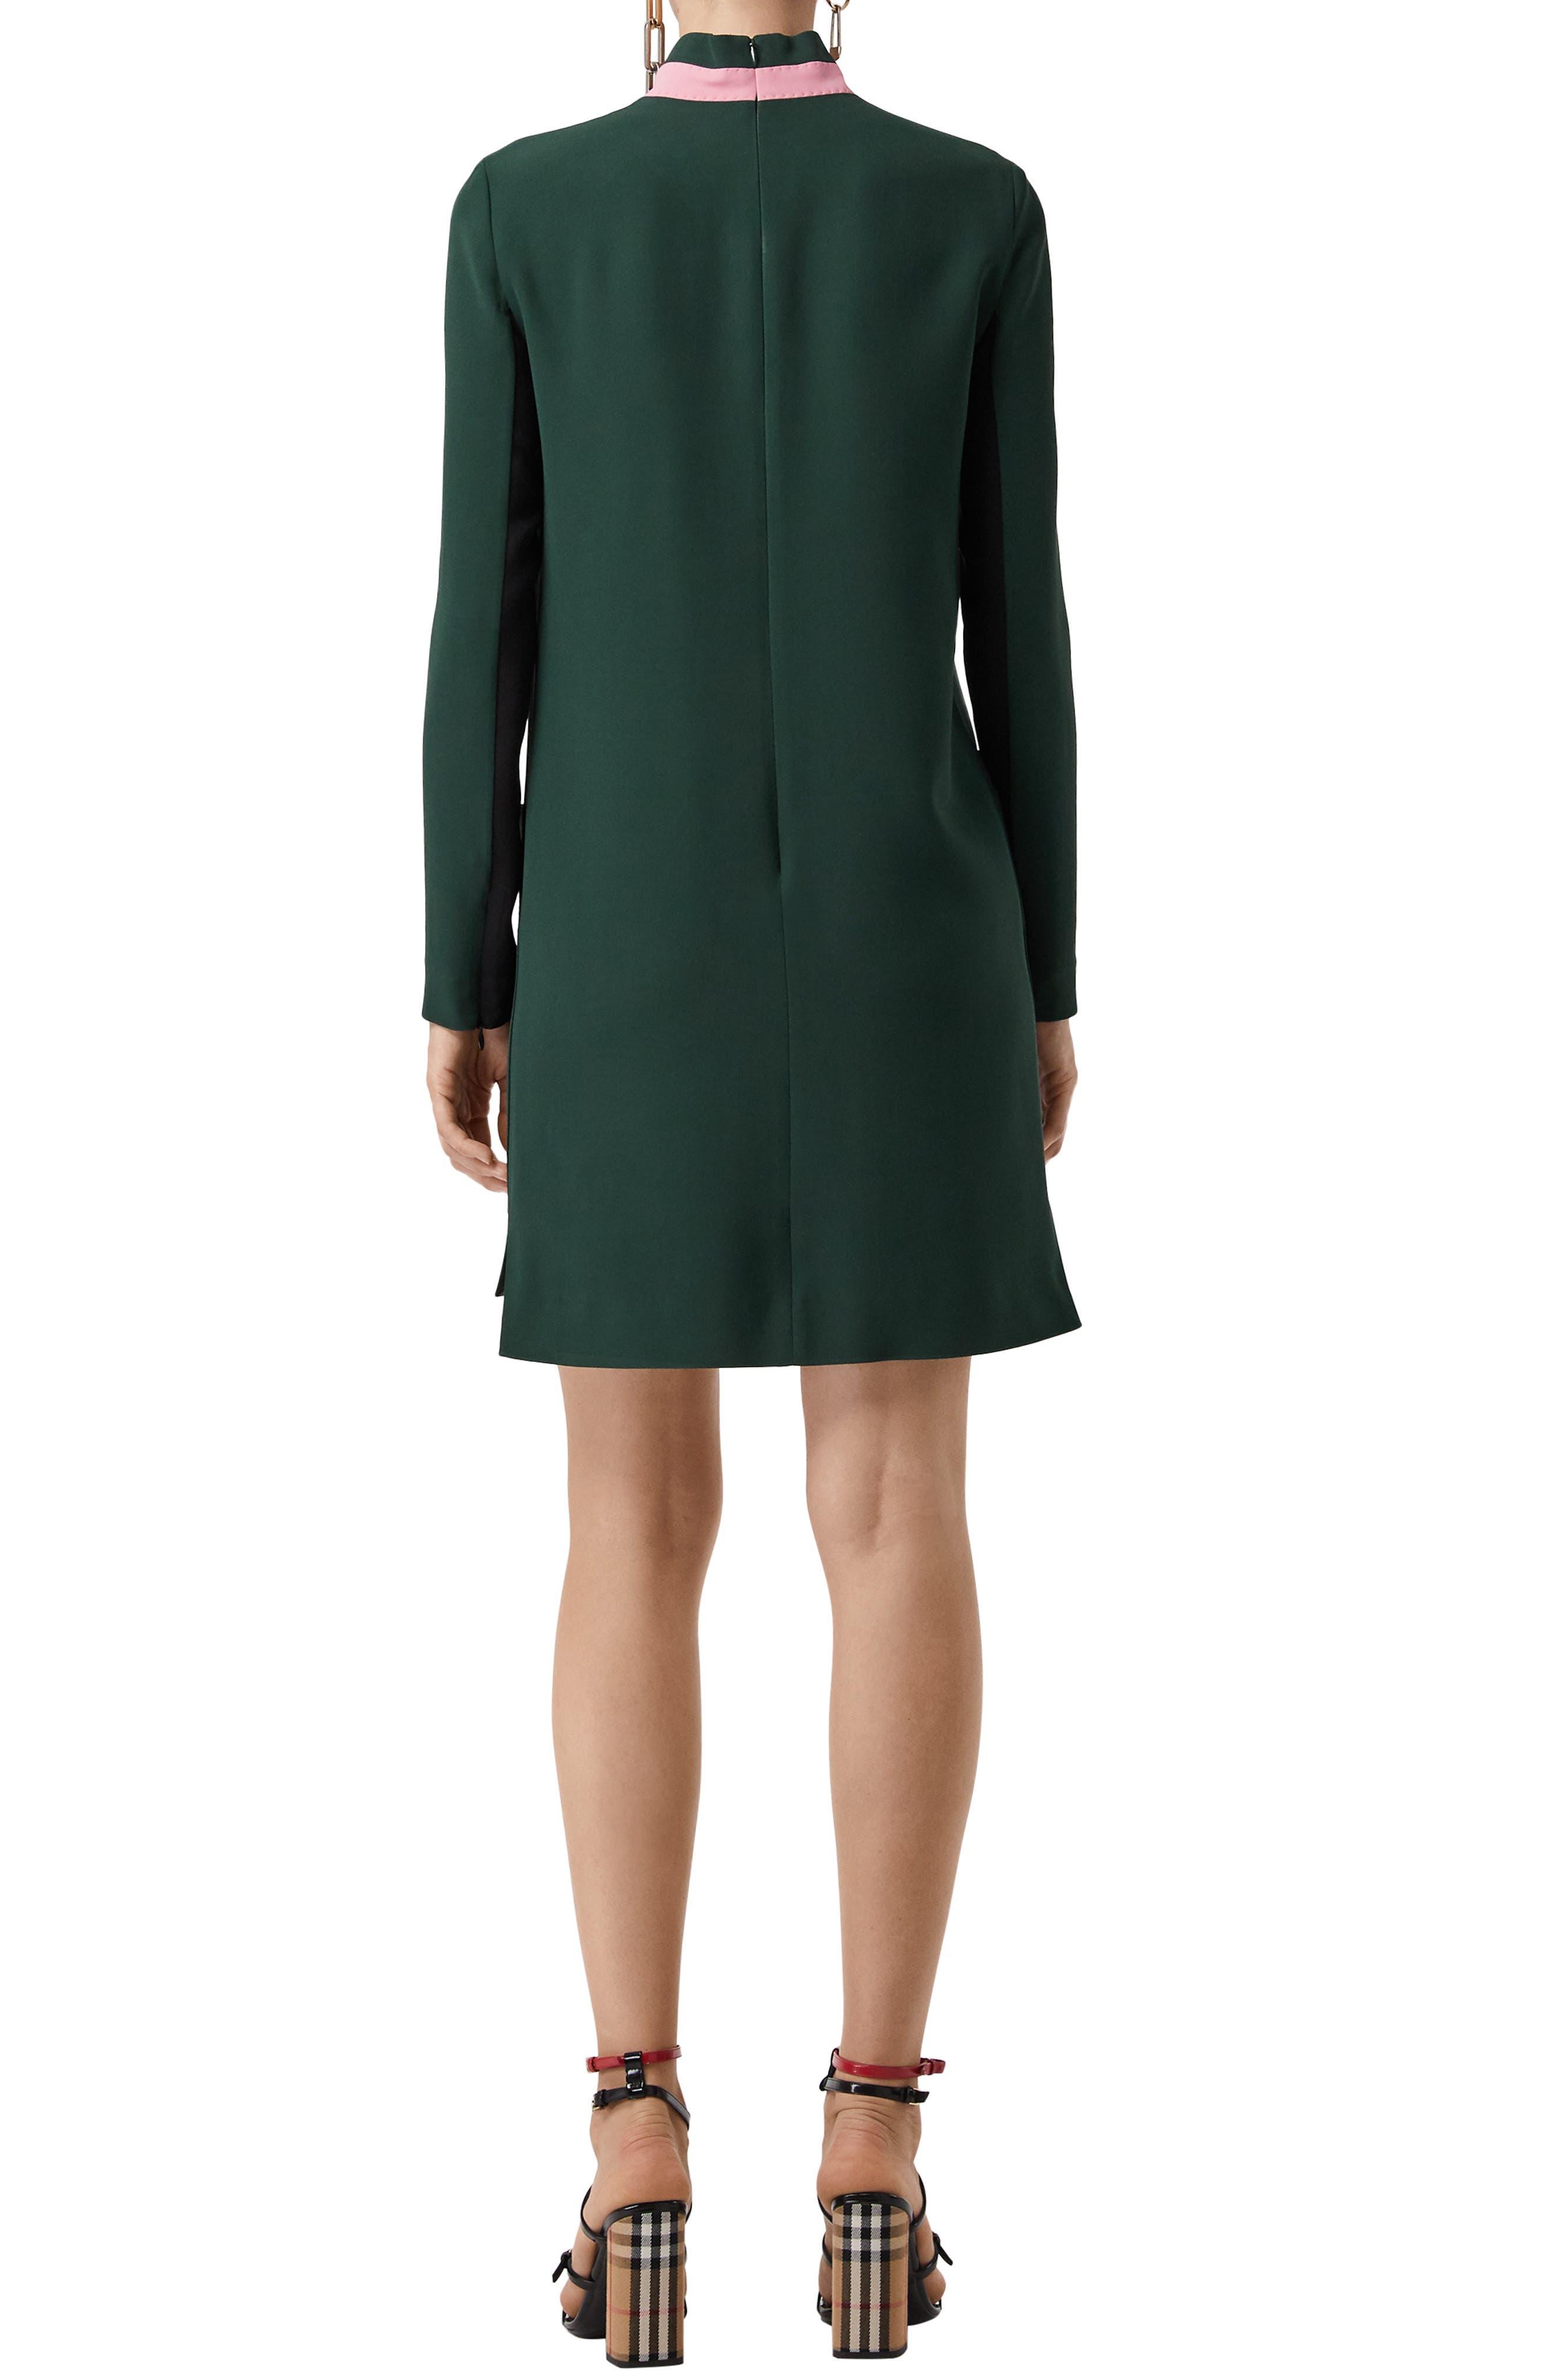 Zoya Two-Tone Shift Dress,                             Alternate thumbnail 2, color,                             301